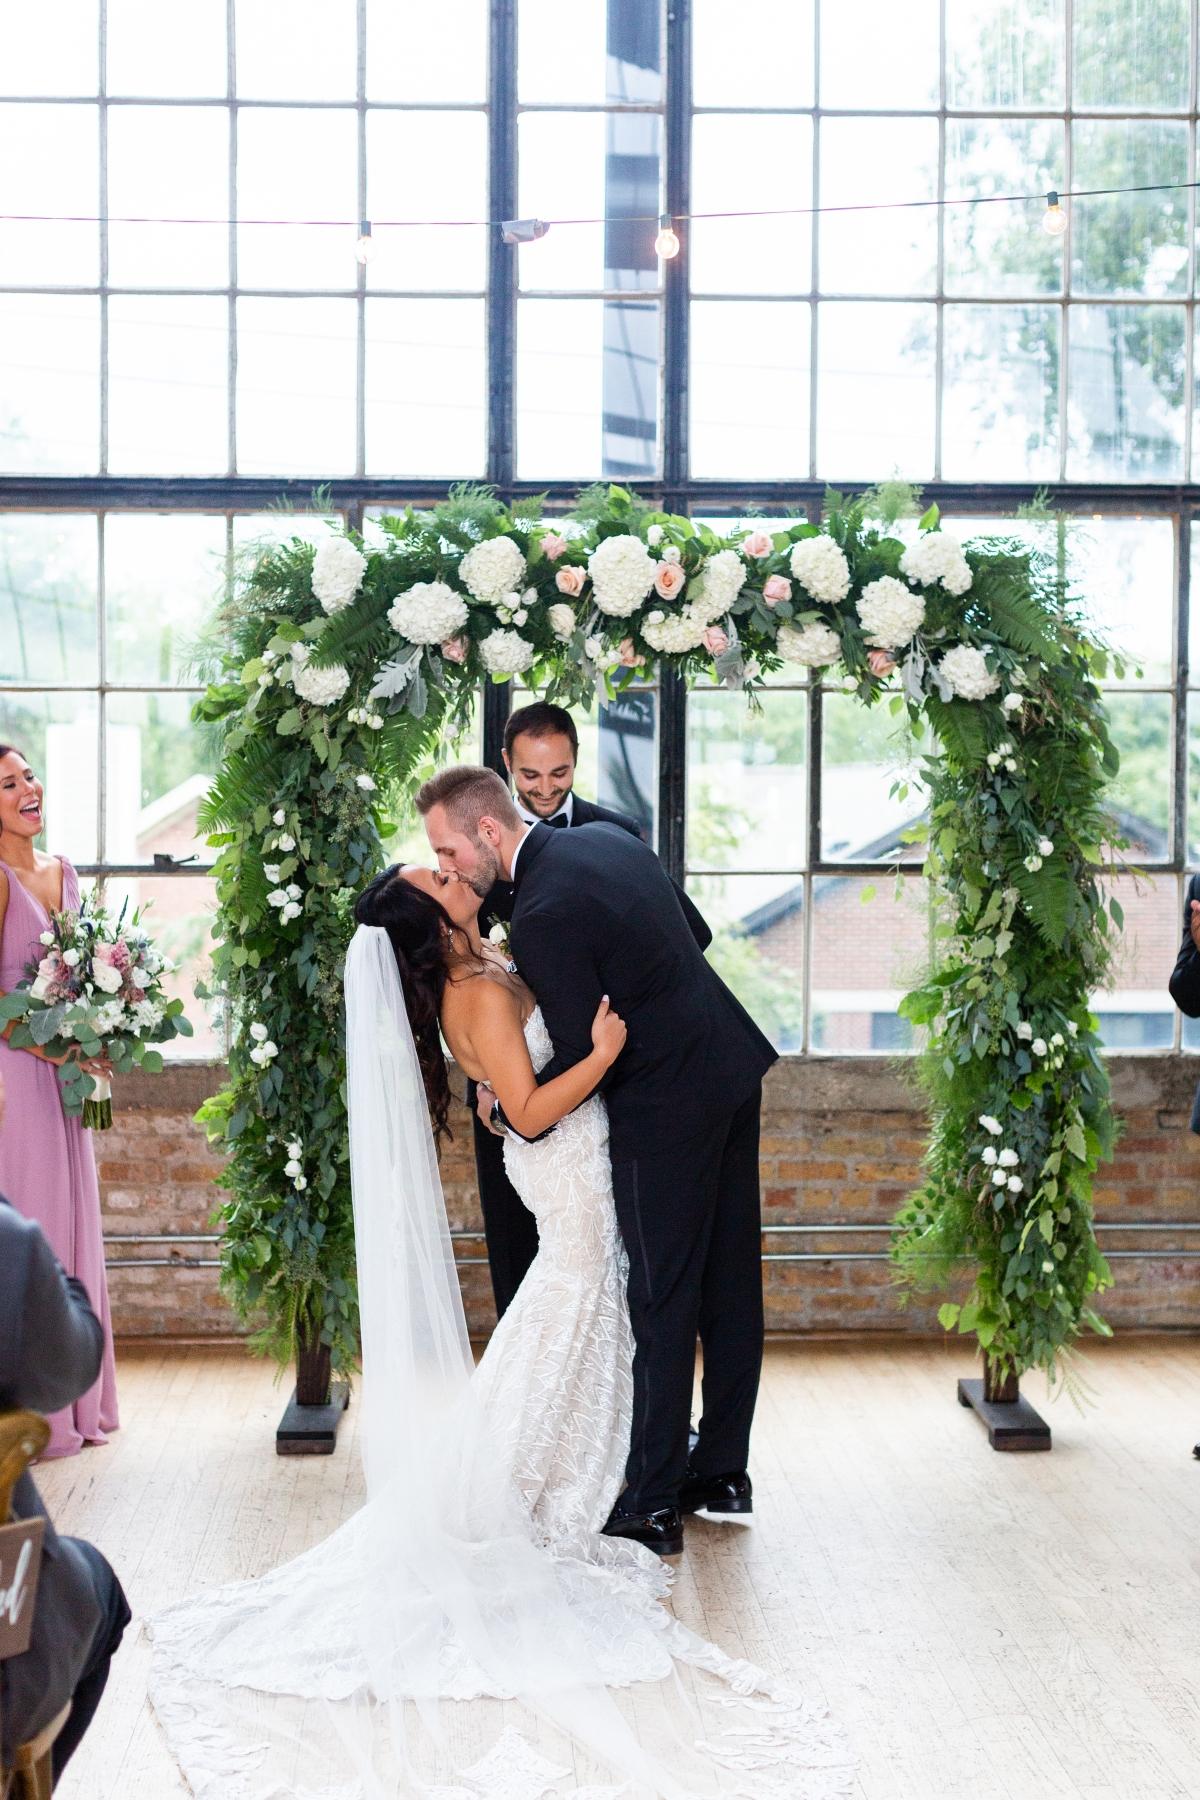 Ravenswood Event Center Chicago Wedding Alexandra Lee Photography 58